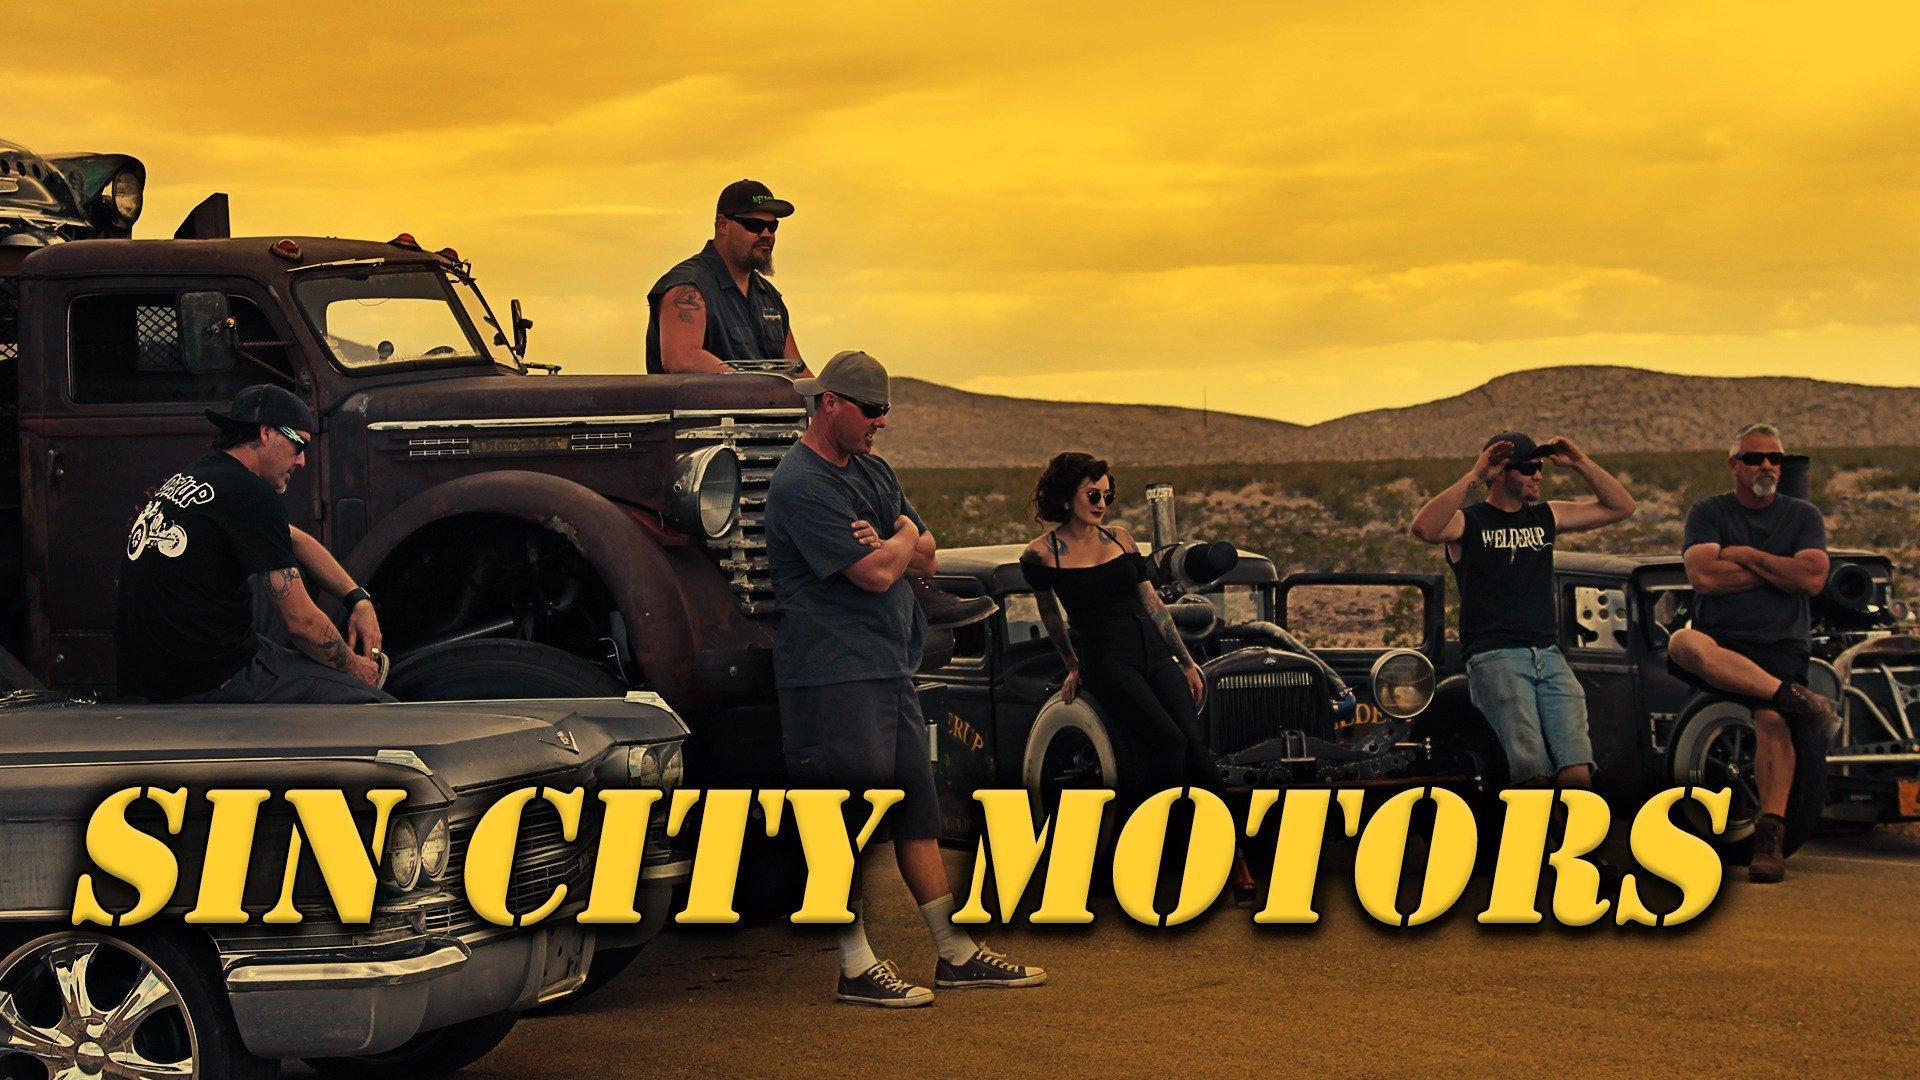 Sin City Motors